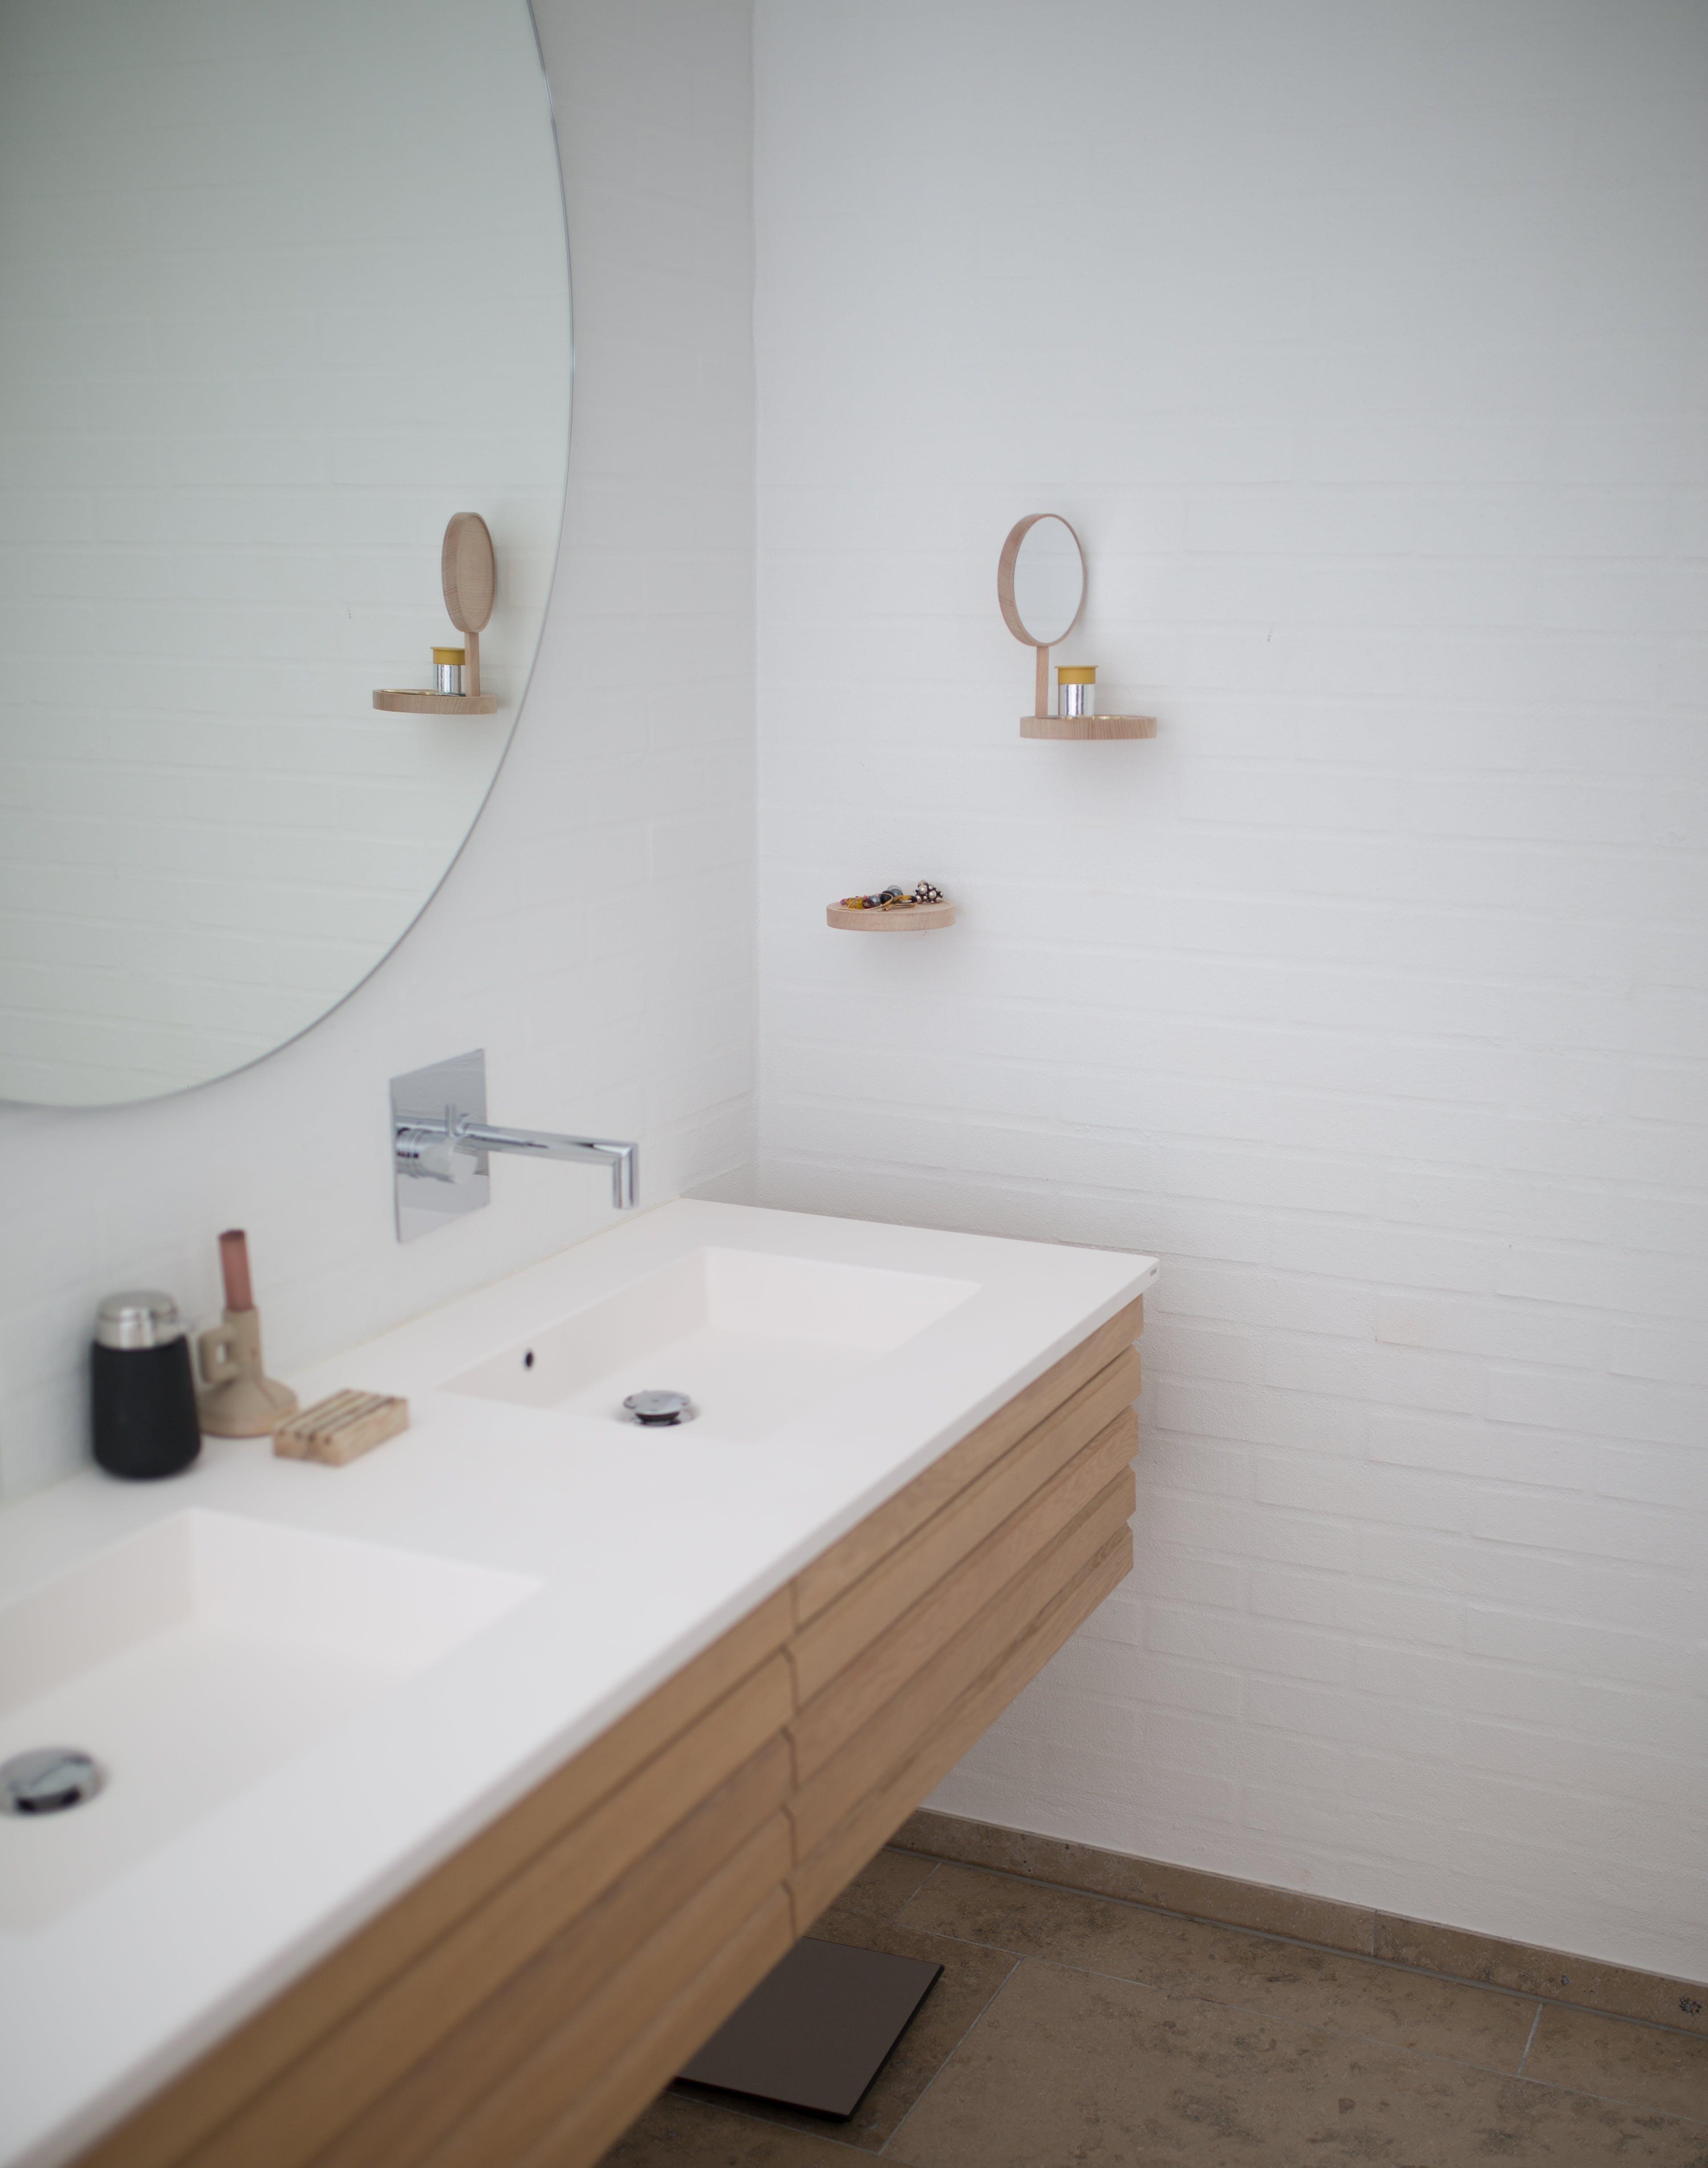 design interiéru, dřez, kohoutek